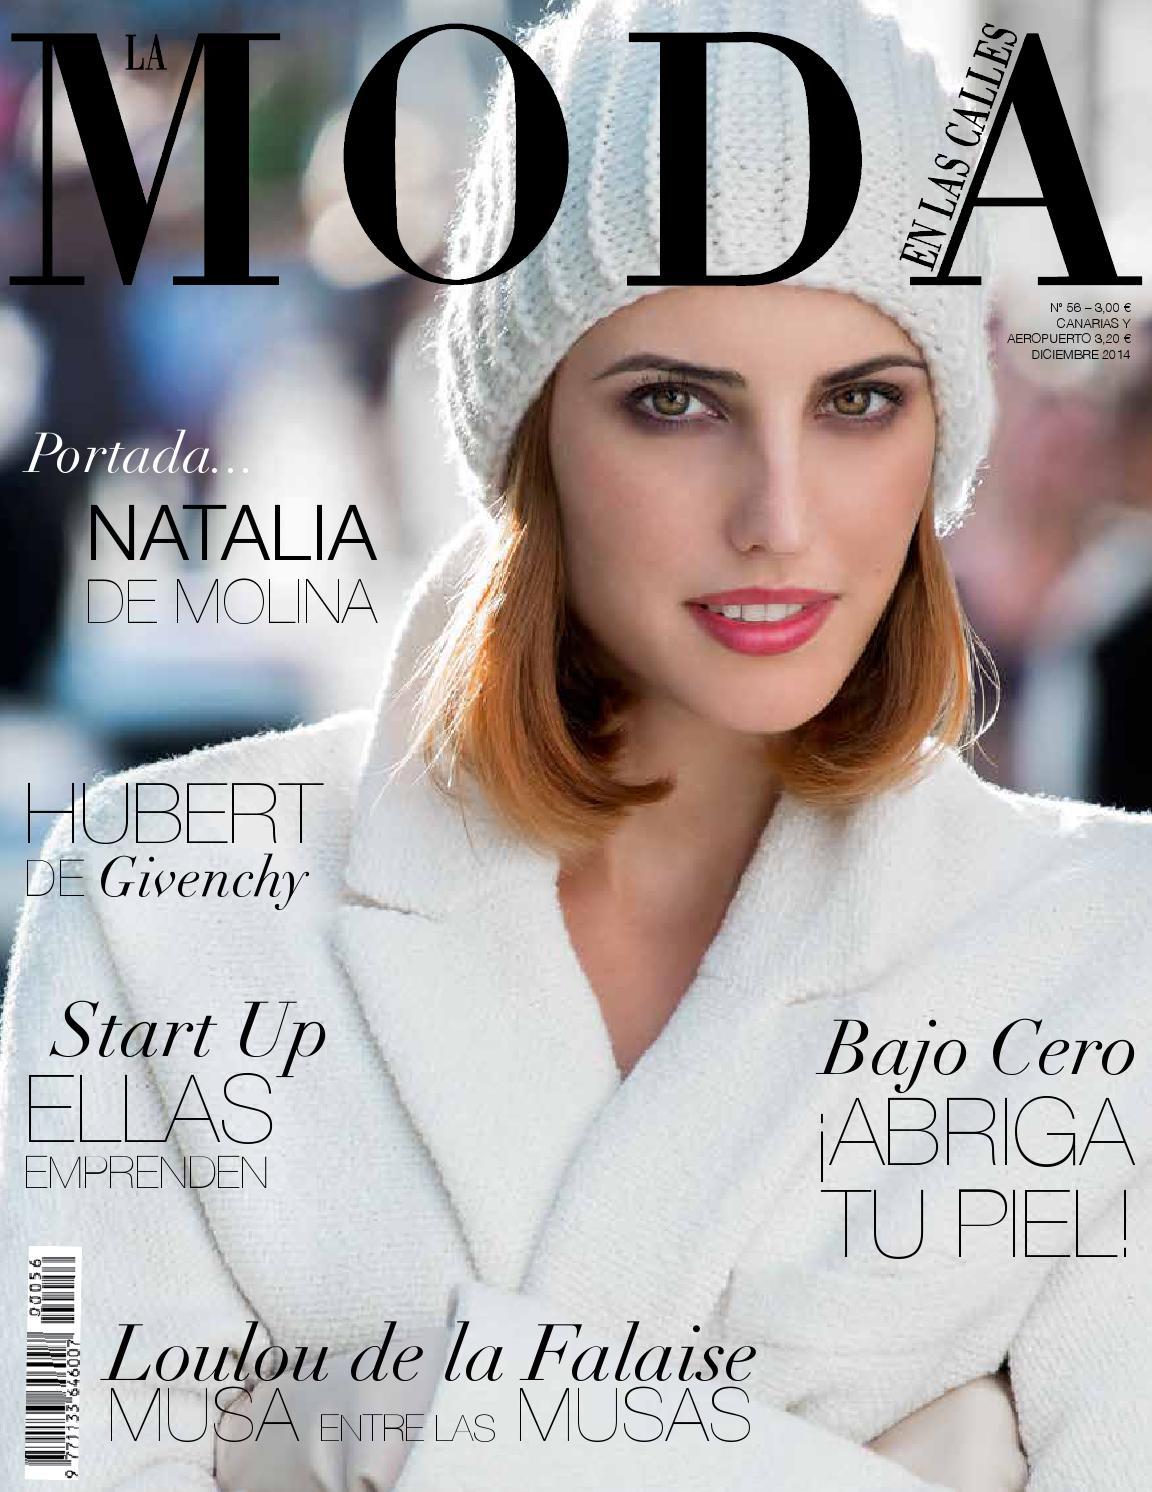 La moda en las calles 56 by EDIMODA - issuu 308a1984e365